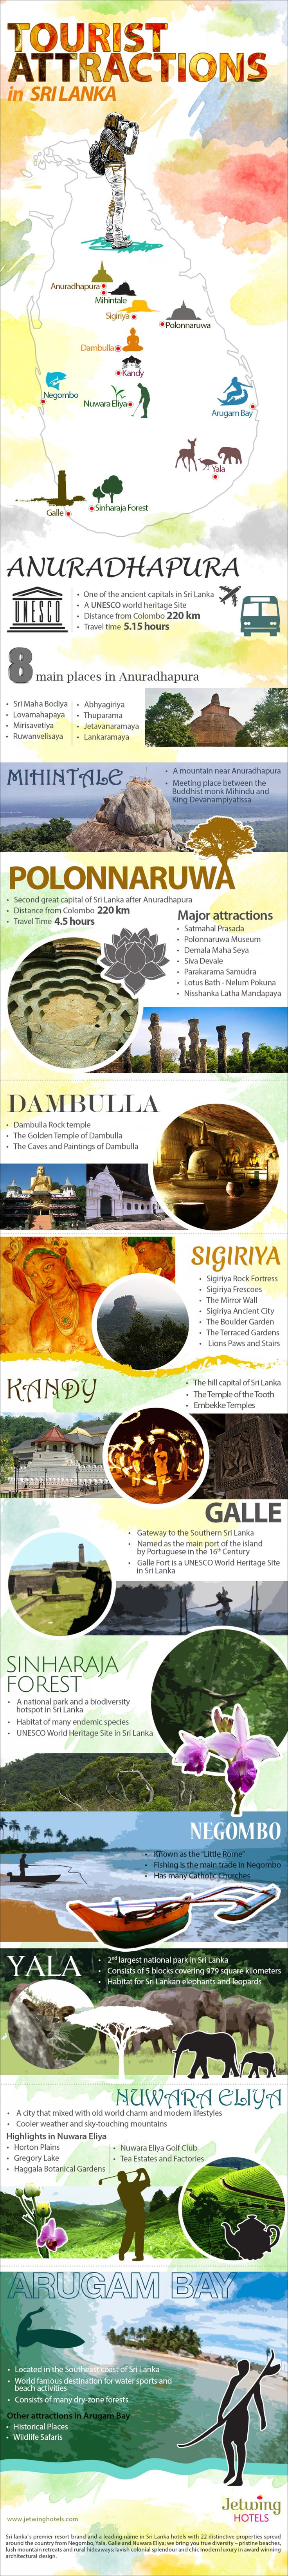 Tourist Attractions in Sri Lanka #Infographic